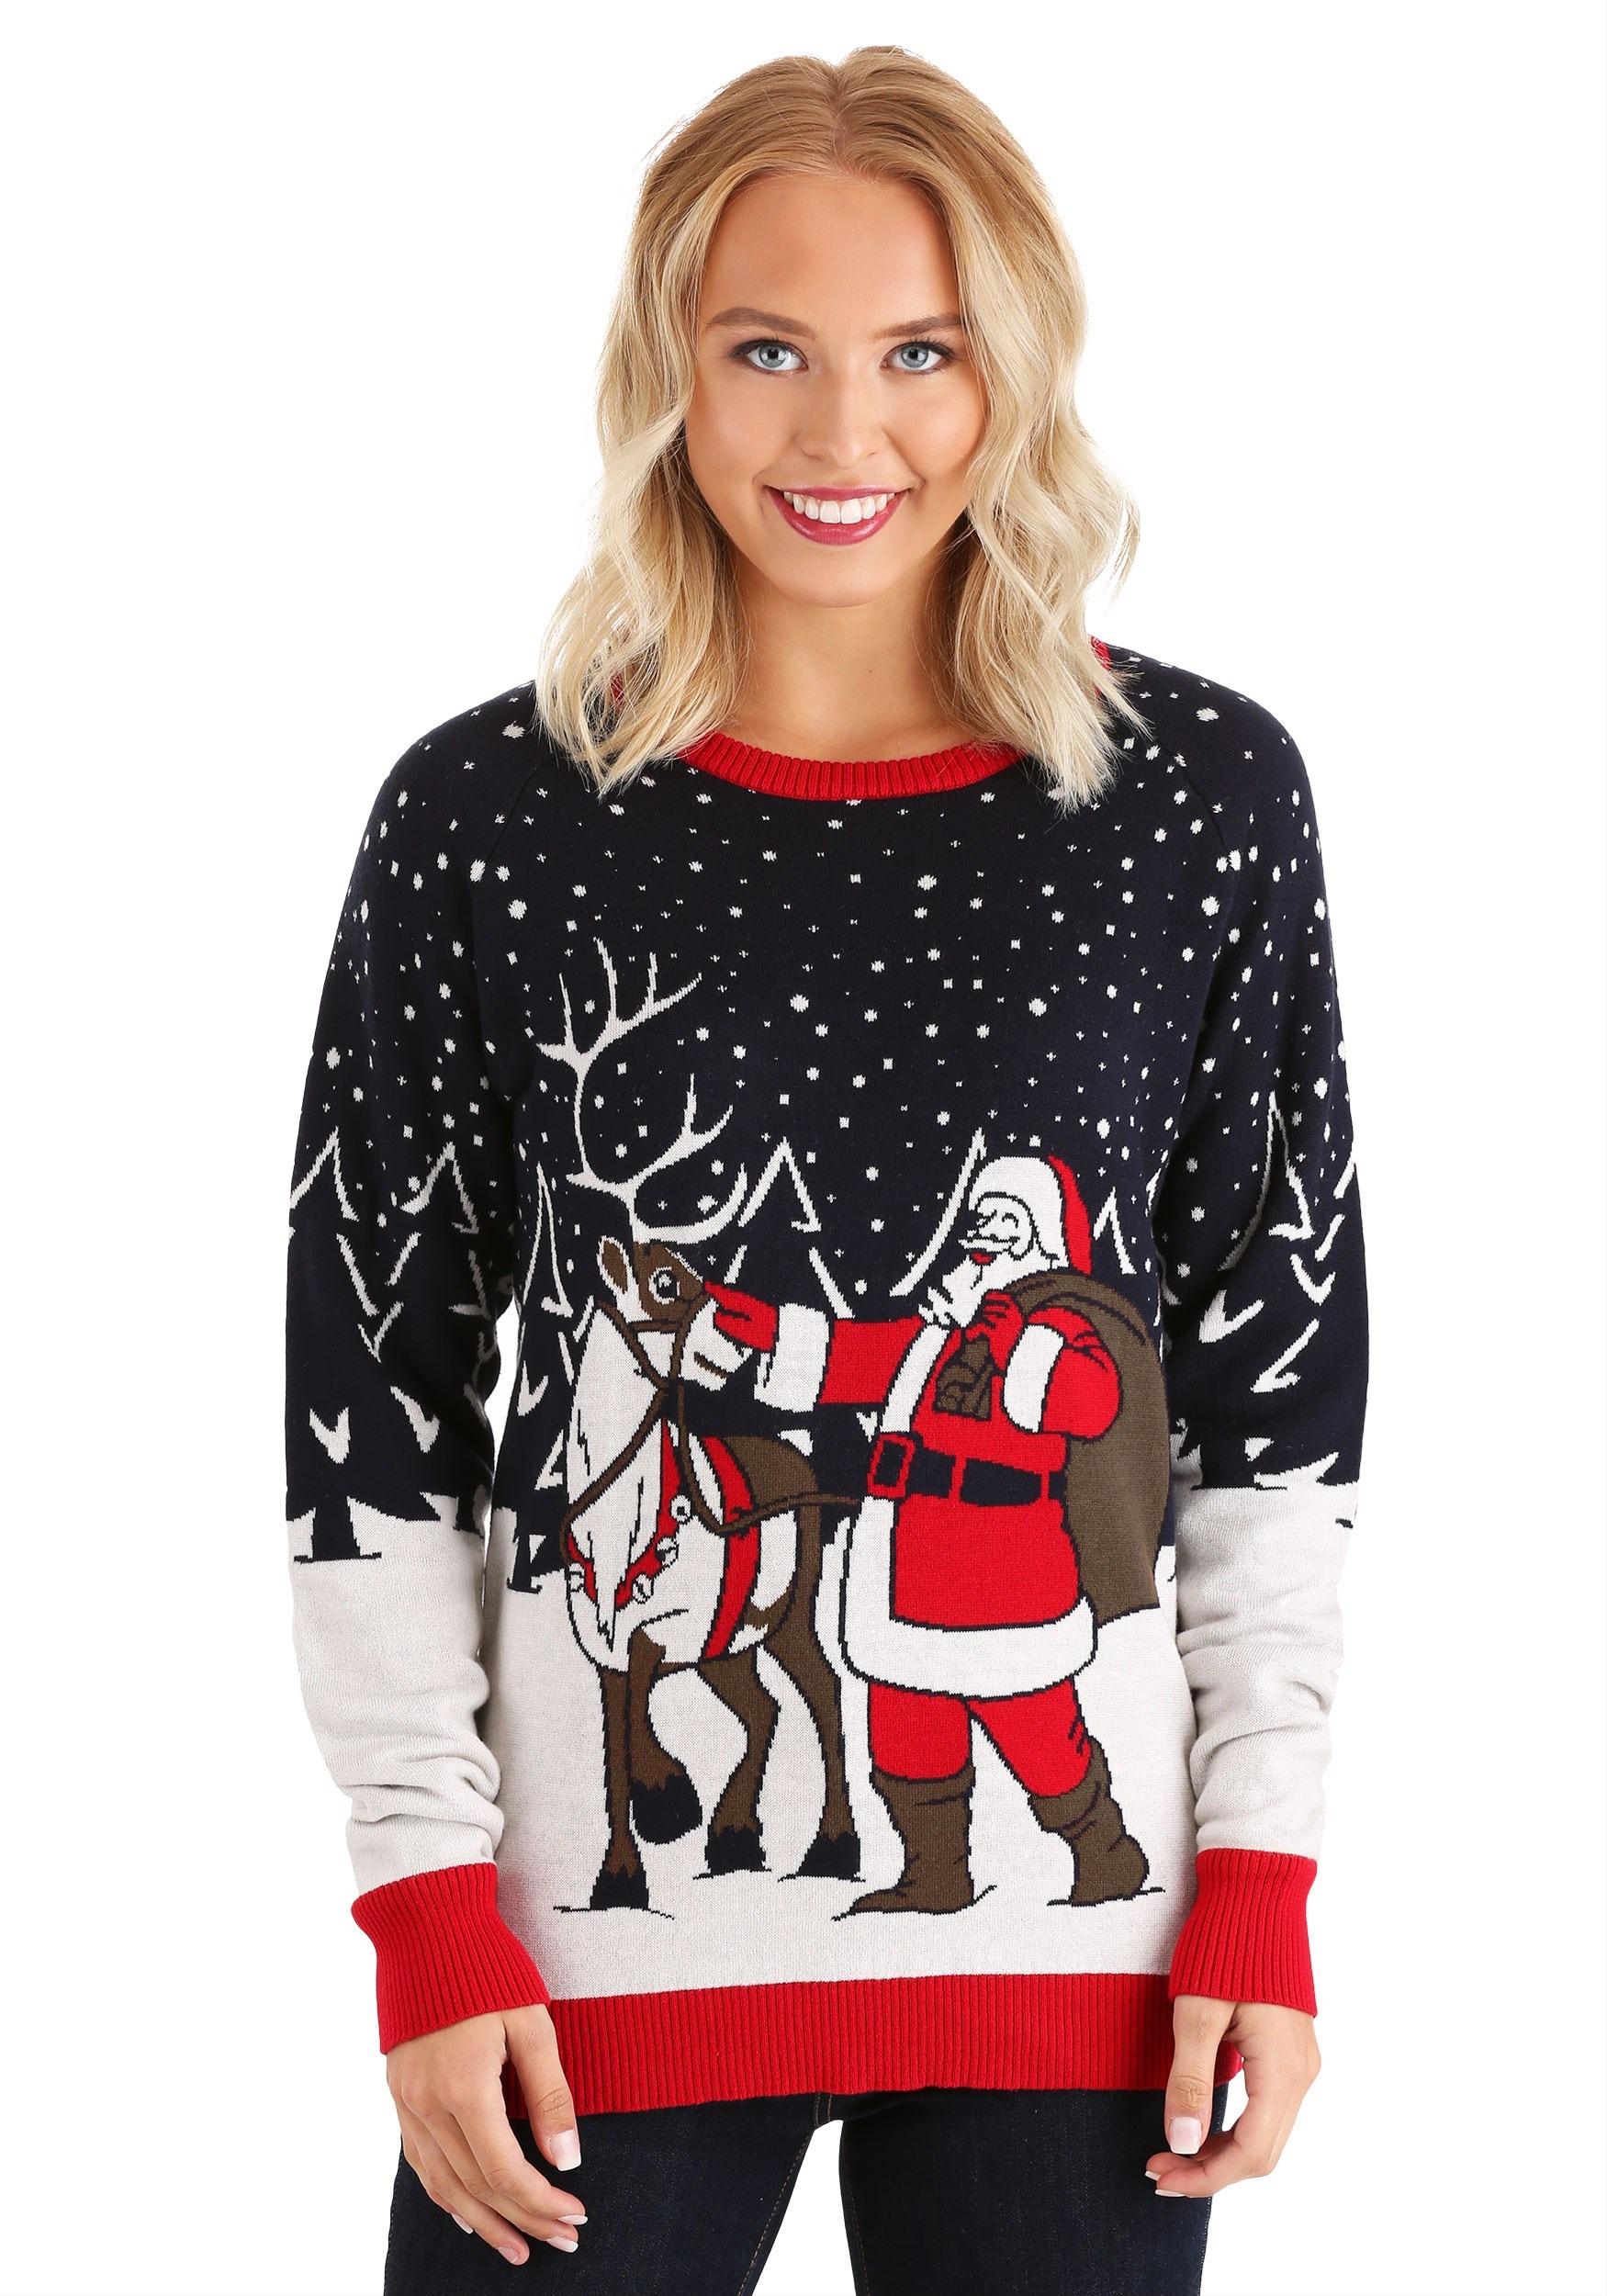 Vintage Santa & Reindeer Ugly Christmas Sweater for Adults